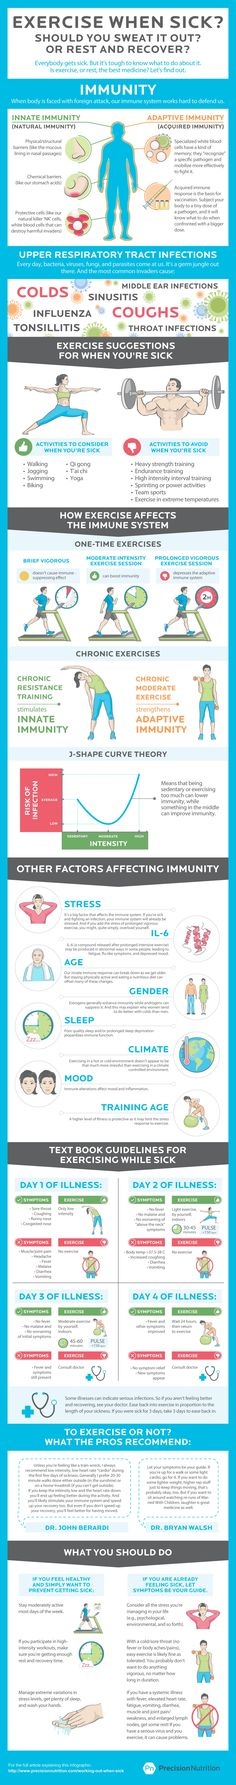 precision-nutrition-exercise-when-sick-image